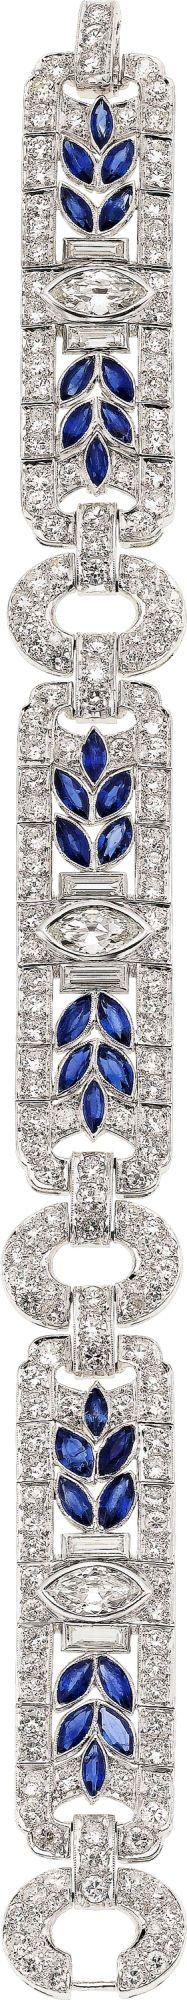 Art Deco Diamond and Sapphire  Platinum Bracelet, M. Waslikoff